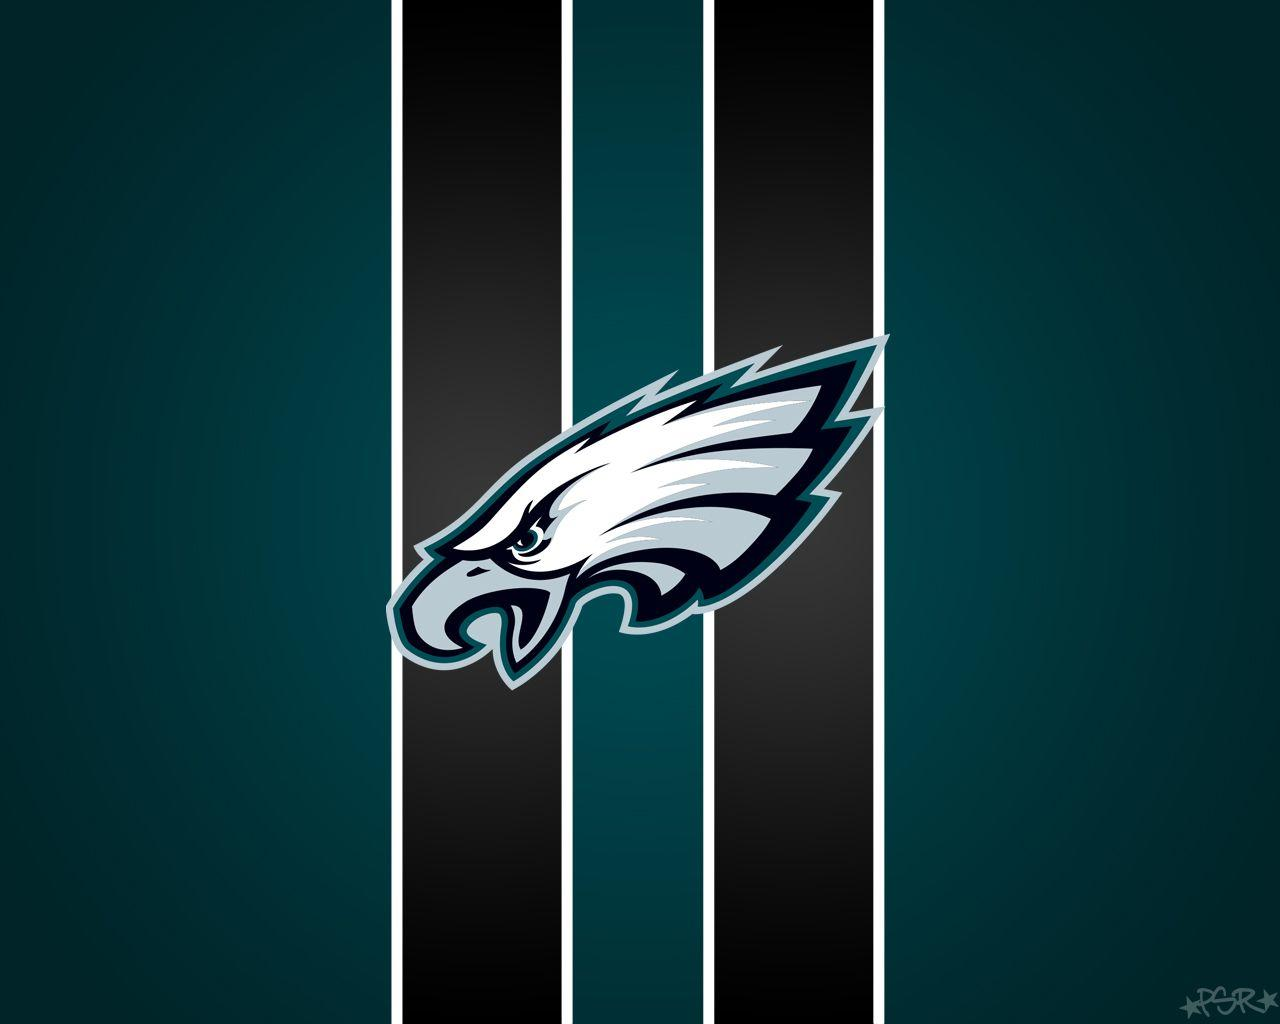 Eagles football team wallpaper - photo#8